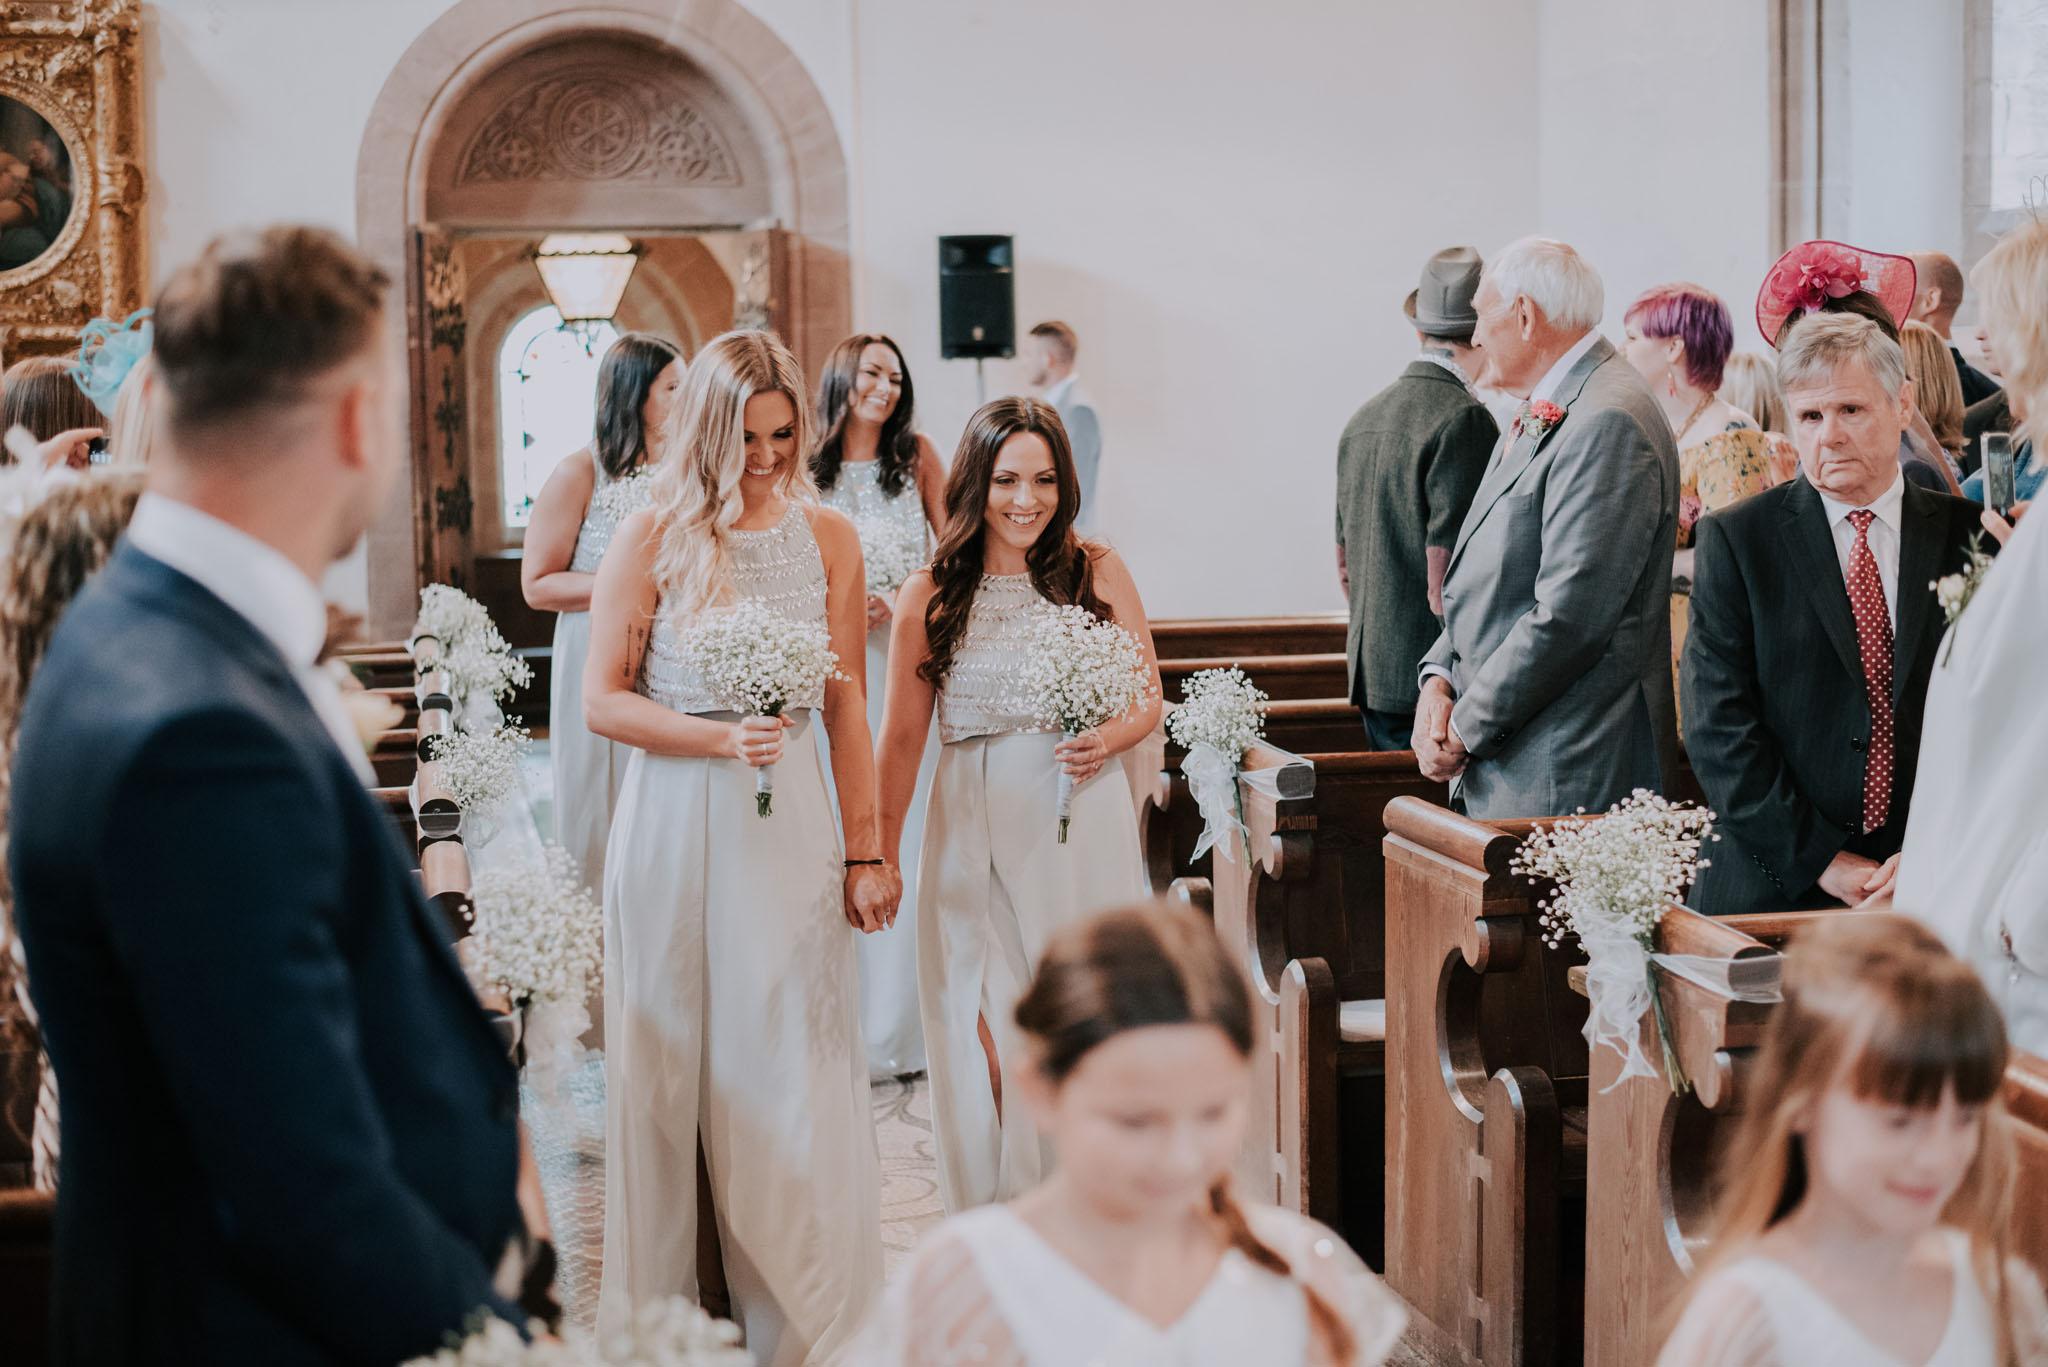 wedding-photographer-glewstone-court-hereford-scott-stockwell-photography158.jpg